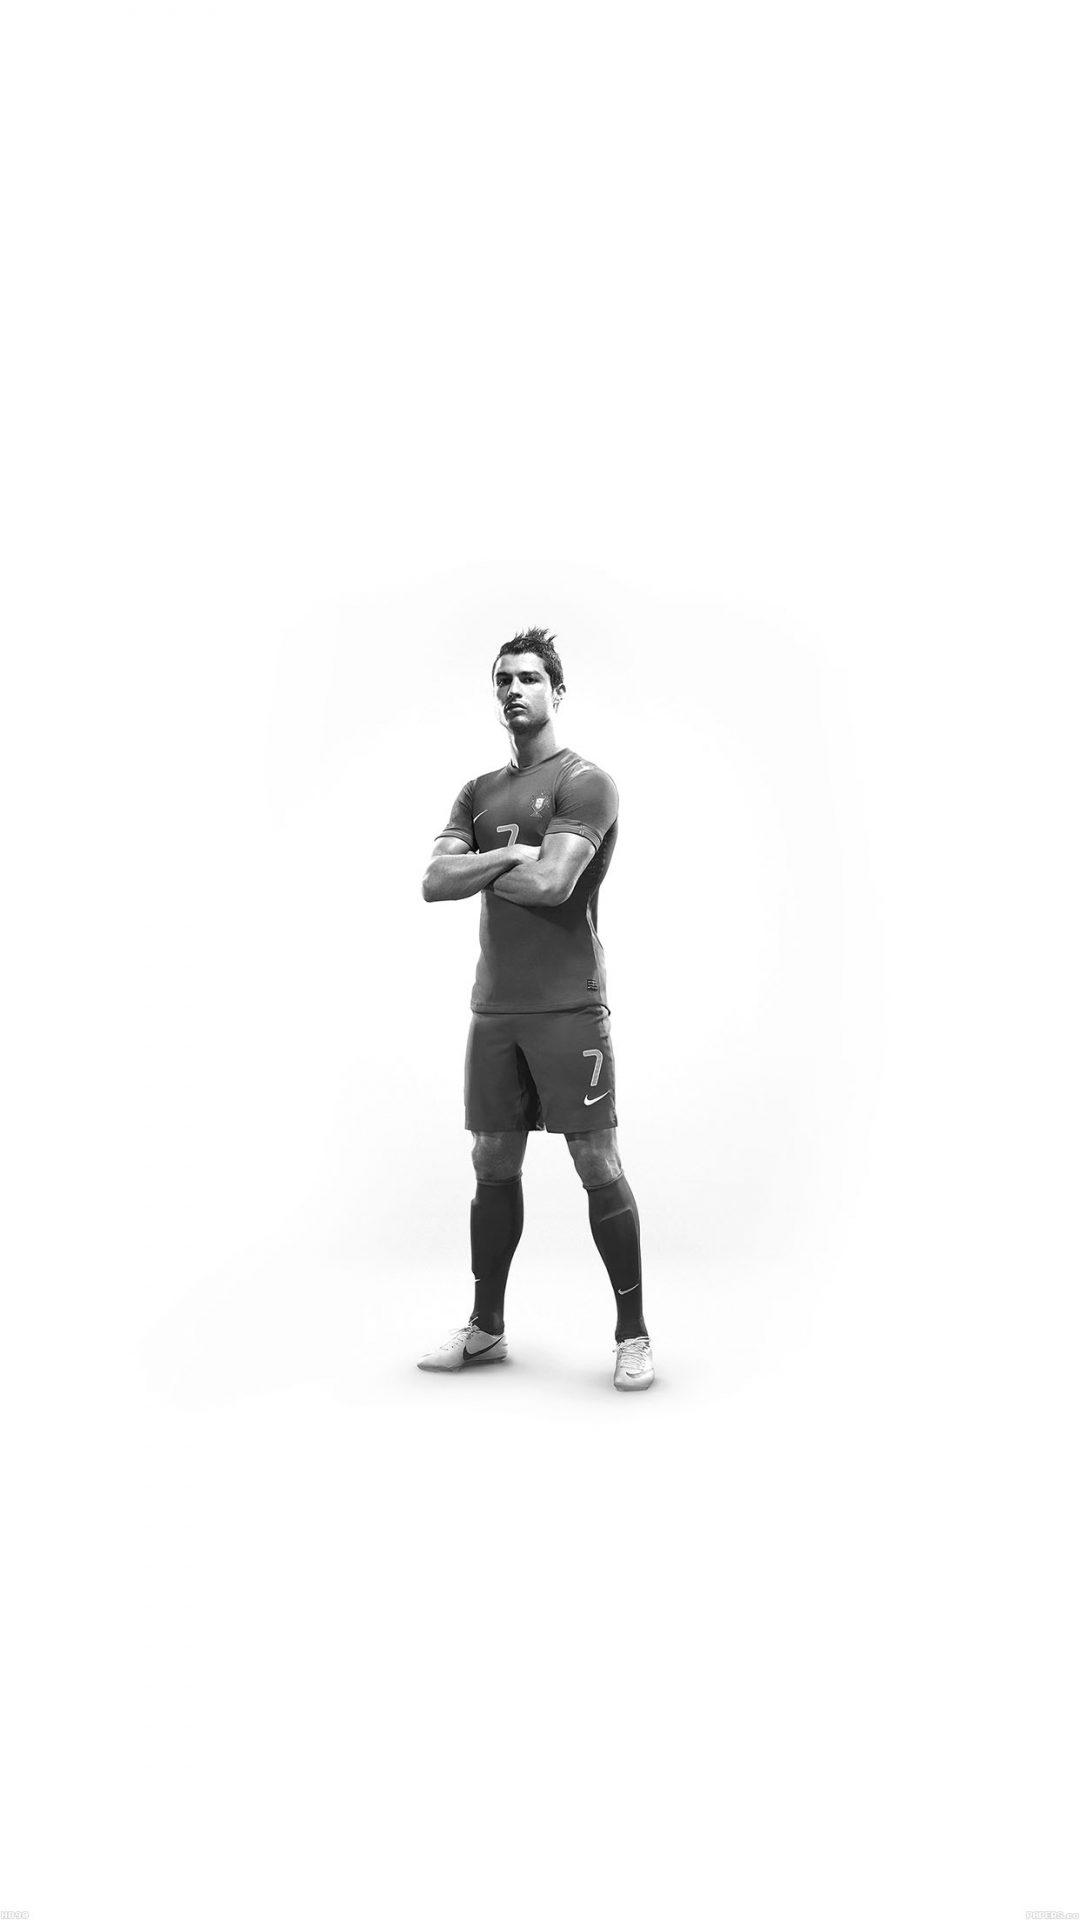 Christiano Ronaldo 7 Proud White